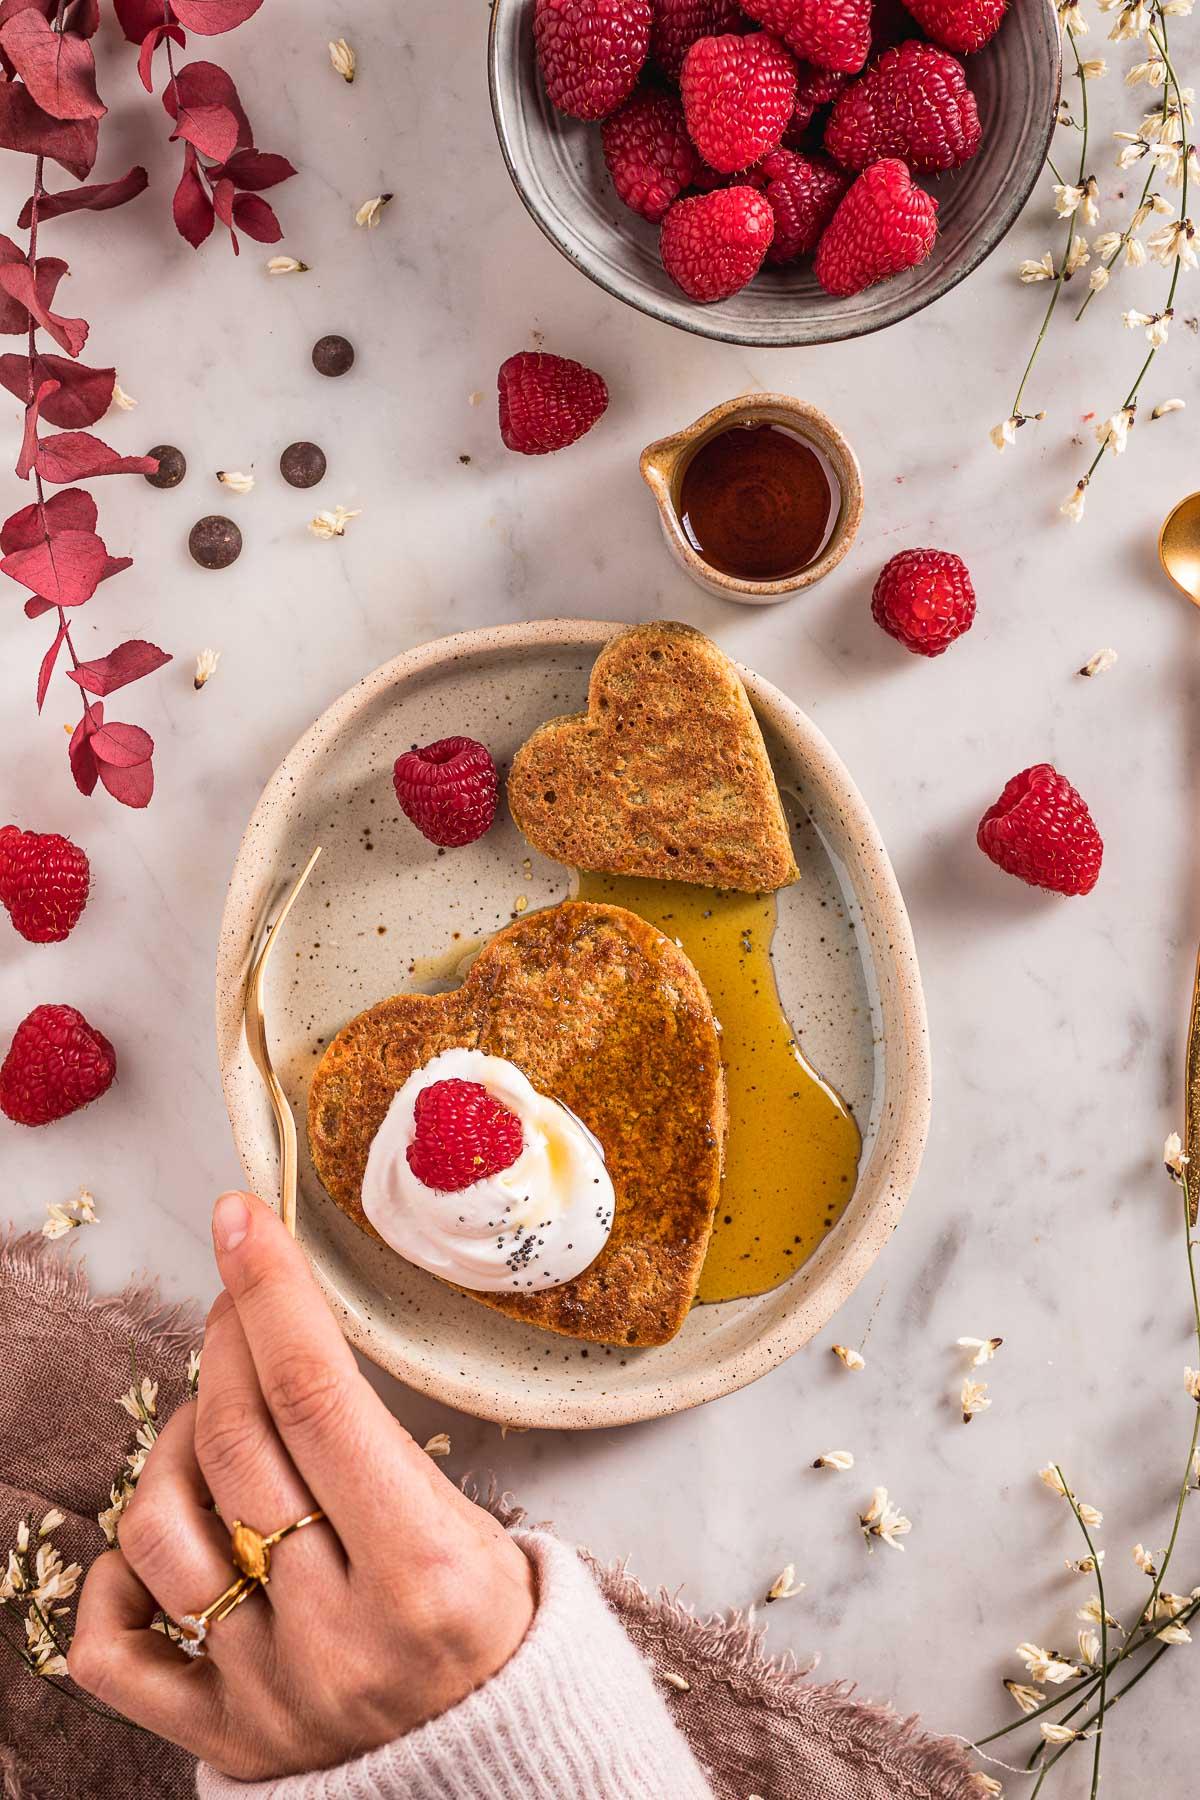 Easy blender gluten-free vegan oat pancakes valentine's day pancakes nut-free recipe ricetta pancakes senza glutine senza uova all'avena e cioccolato senza frutta secca Pancakes di San Valentino